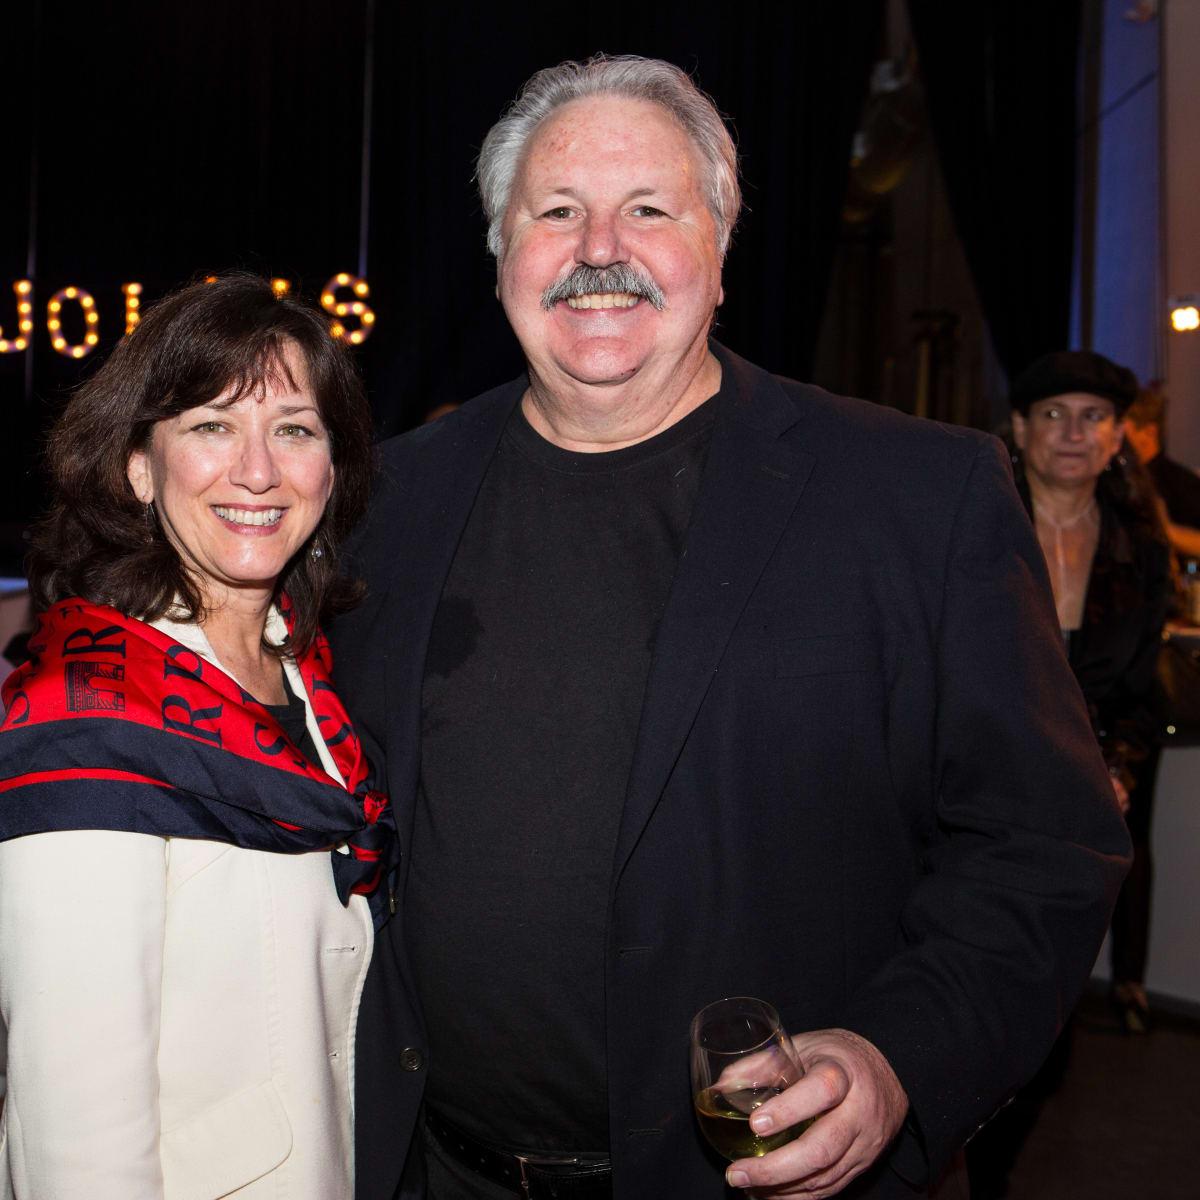 News, Beaujolais Nou eau Festival, Nov. 2015,Lanny Griffith and Debbi Elliott-Griffith